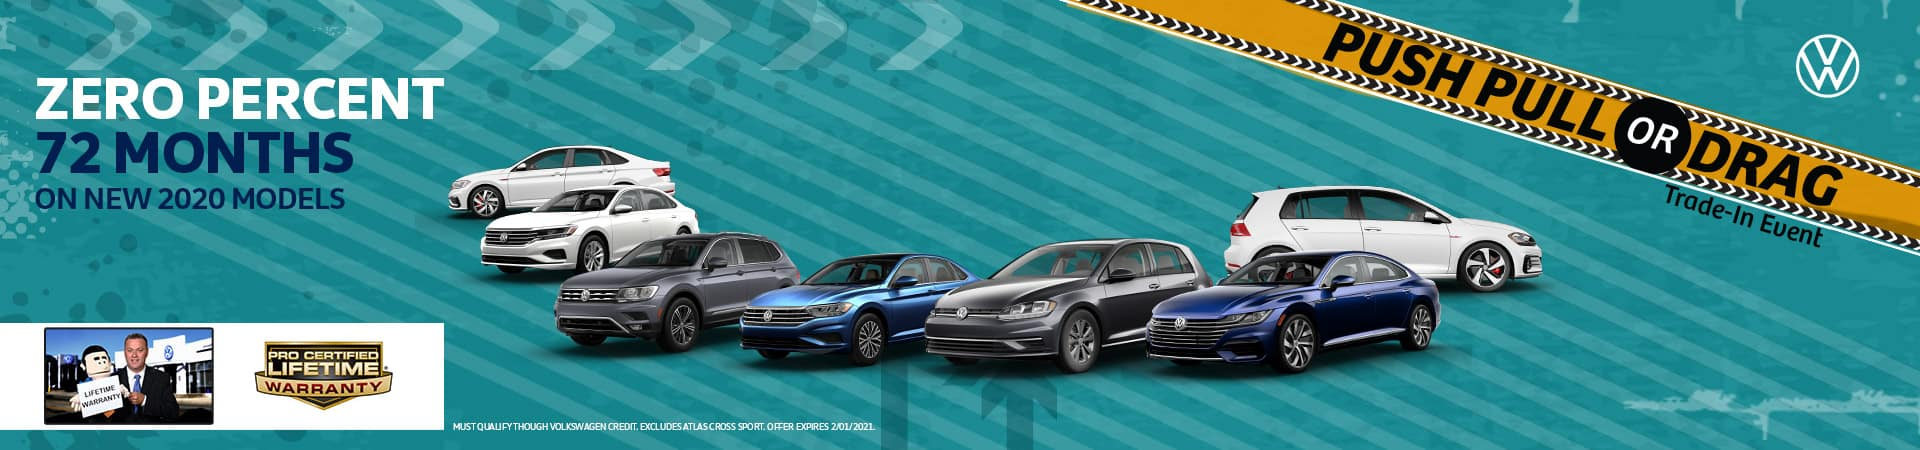 New 2020 Volkswagen Models | Joseph VW of Cincinnati | Cincinnati, OH